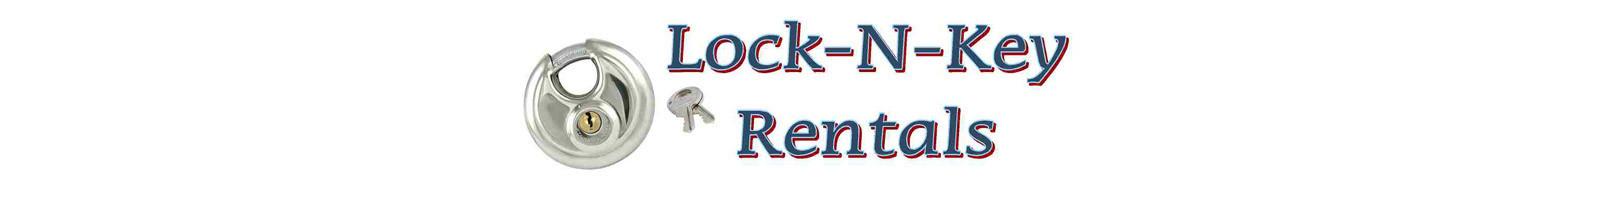 Lock-N-Key Rentals